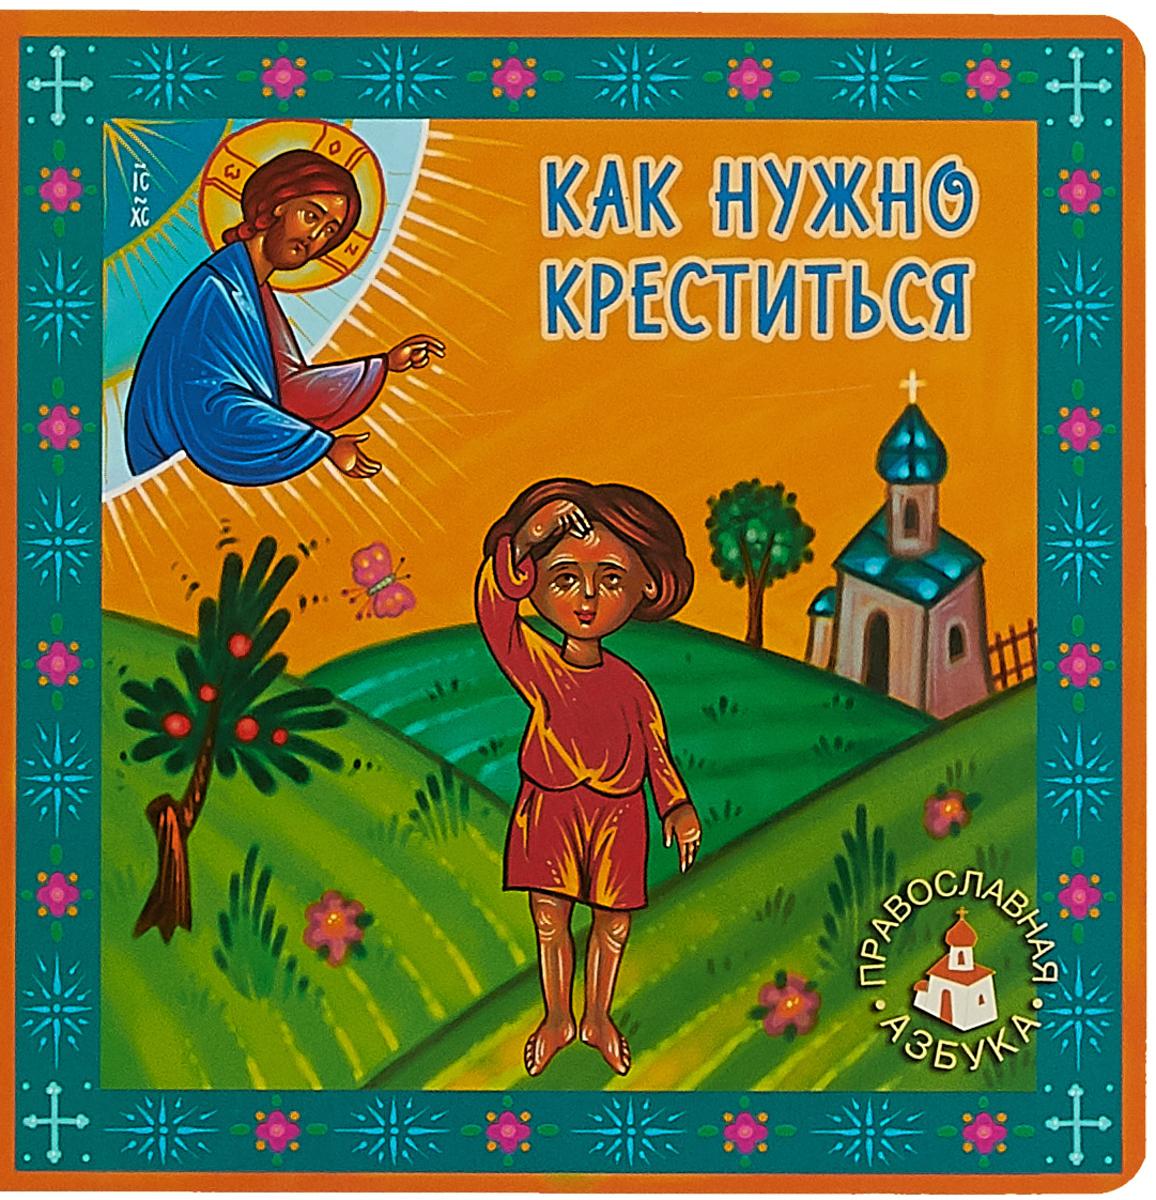 Лидия Попович Как нужно креститься ISBN: 978-5-901246-26-9 лидия попович кто как бога славит